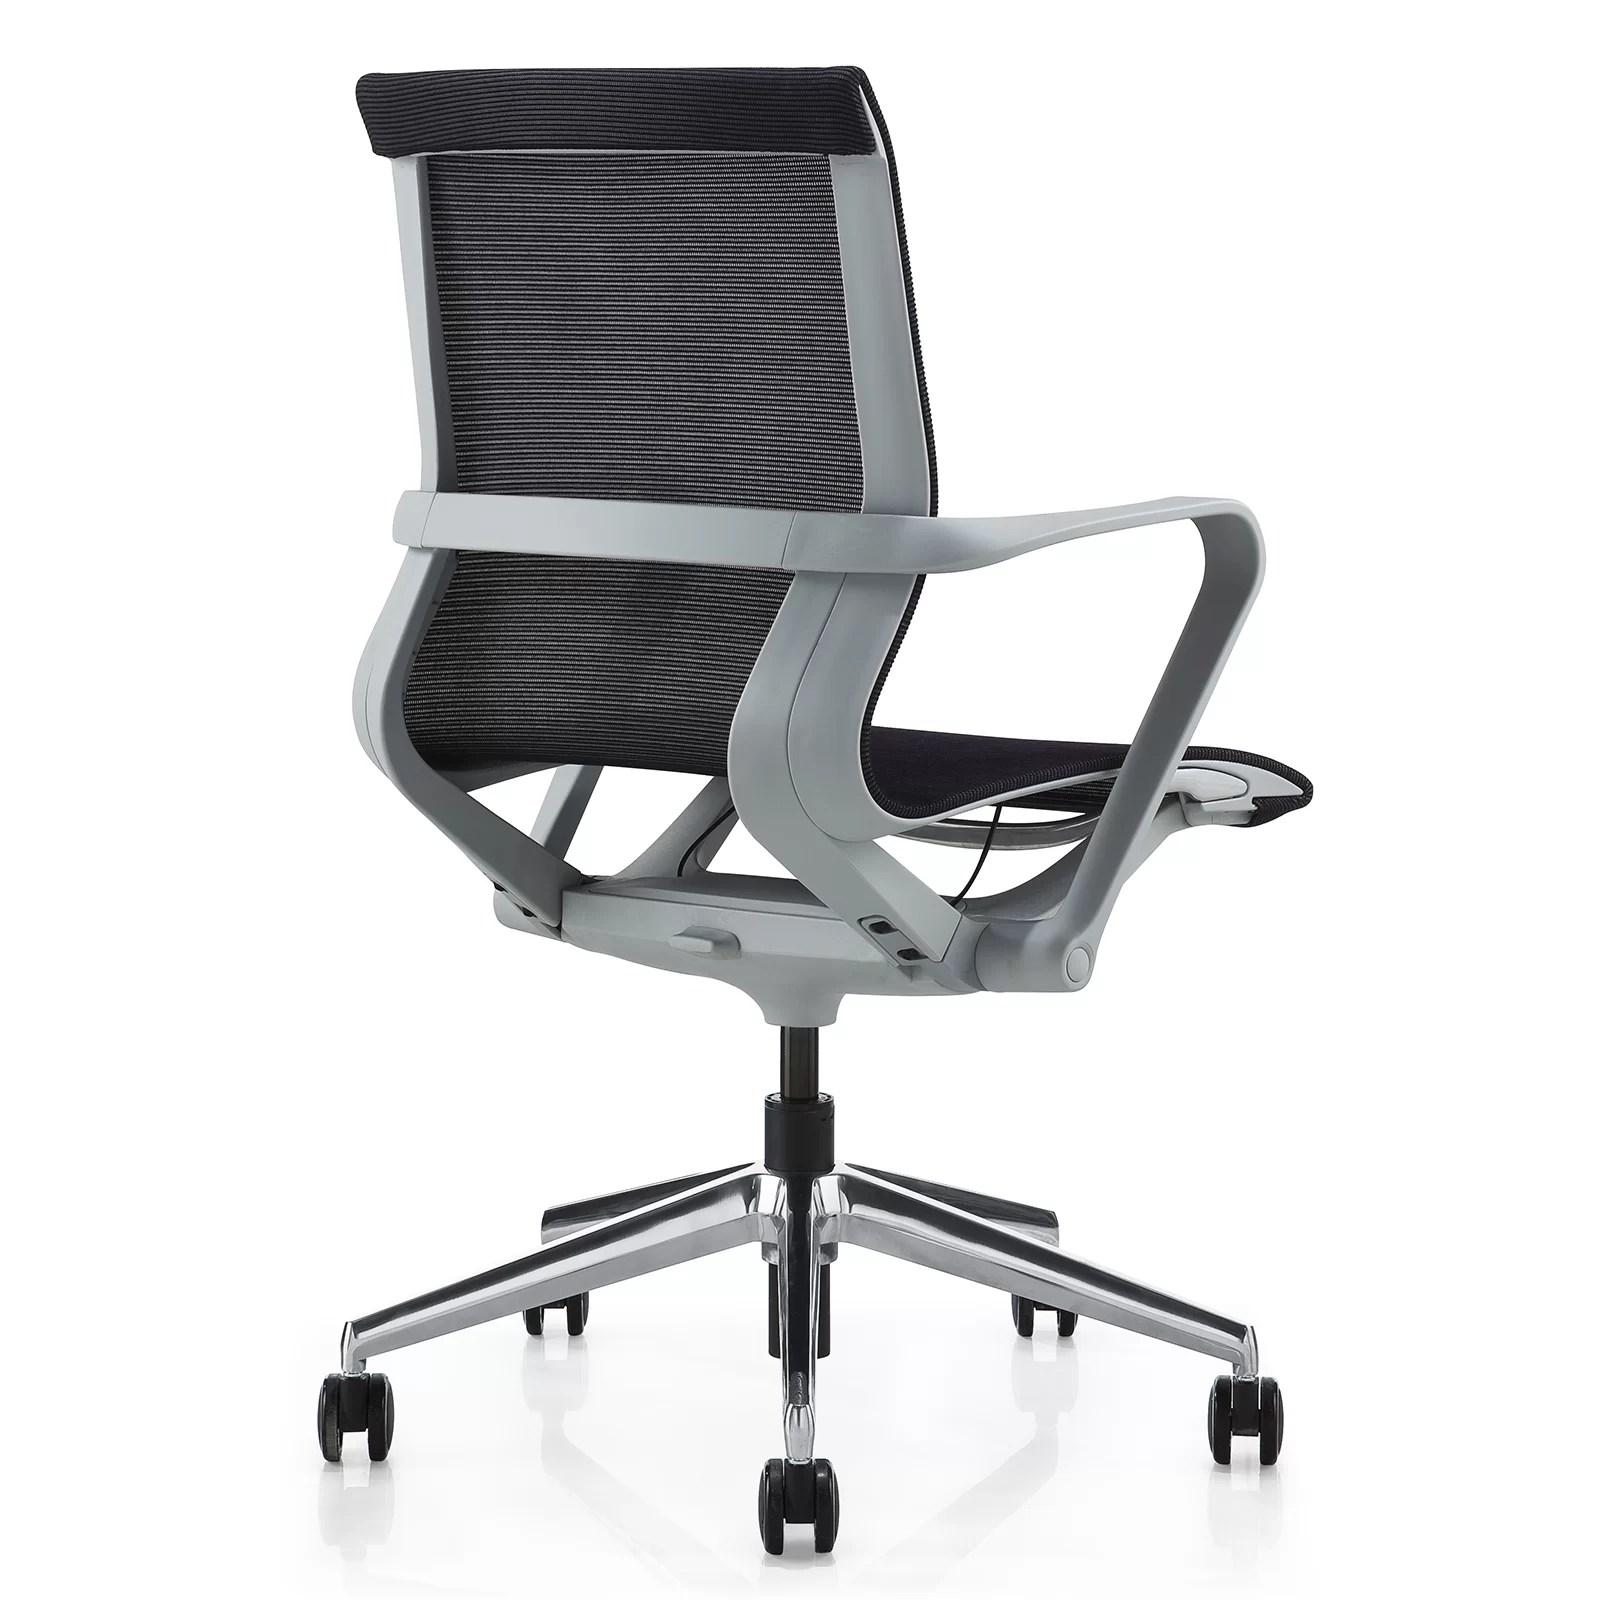 desk chair reviews rocking recliner chairs meelano mesh and wayfair